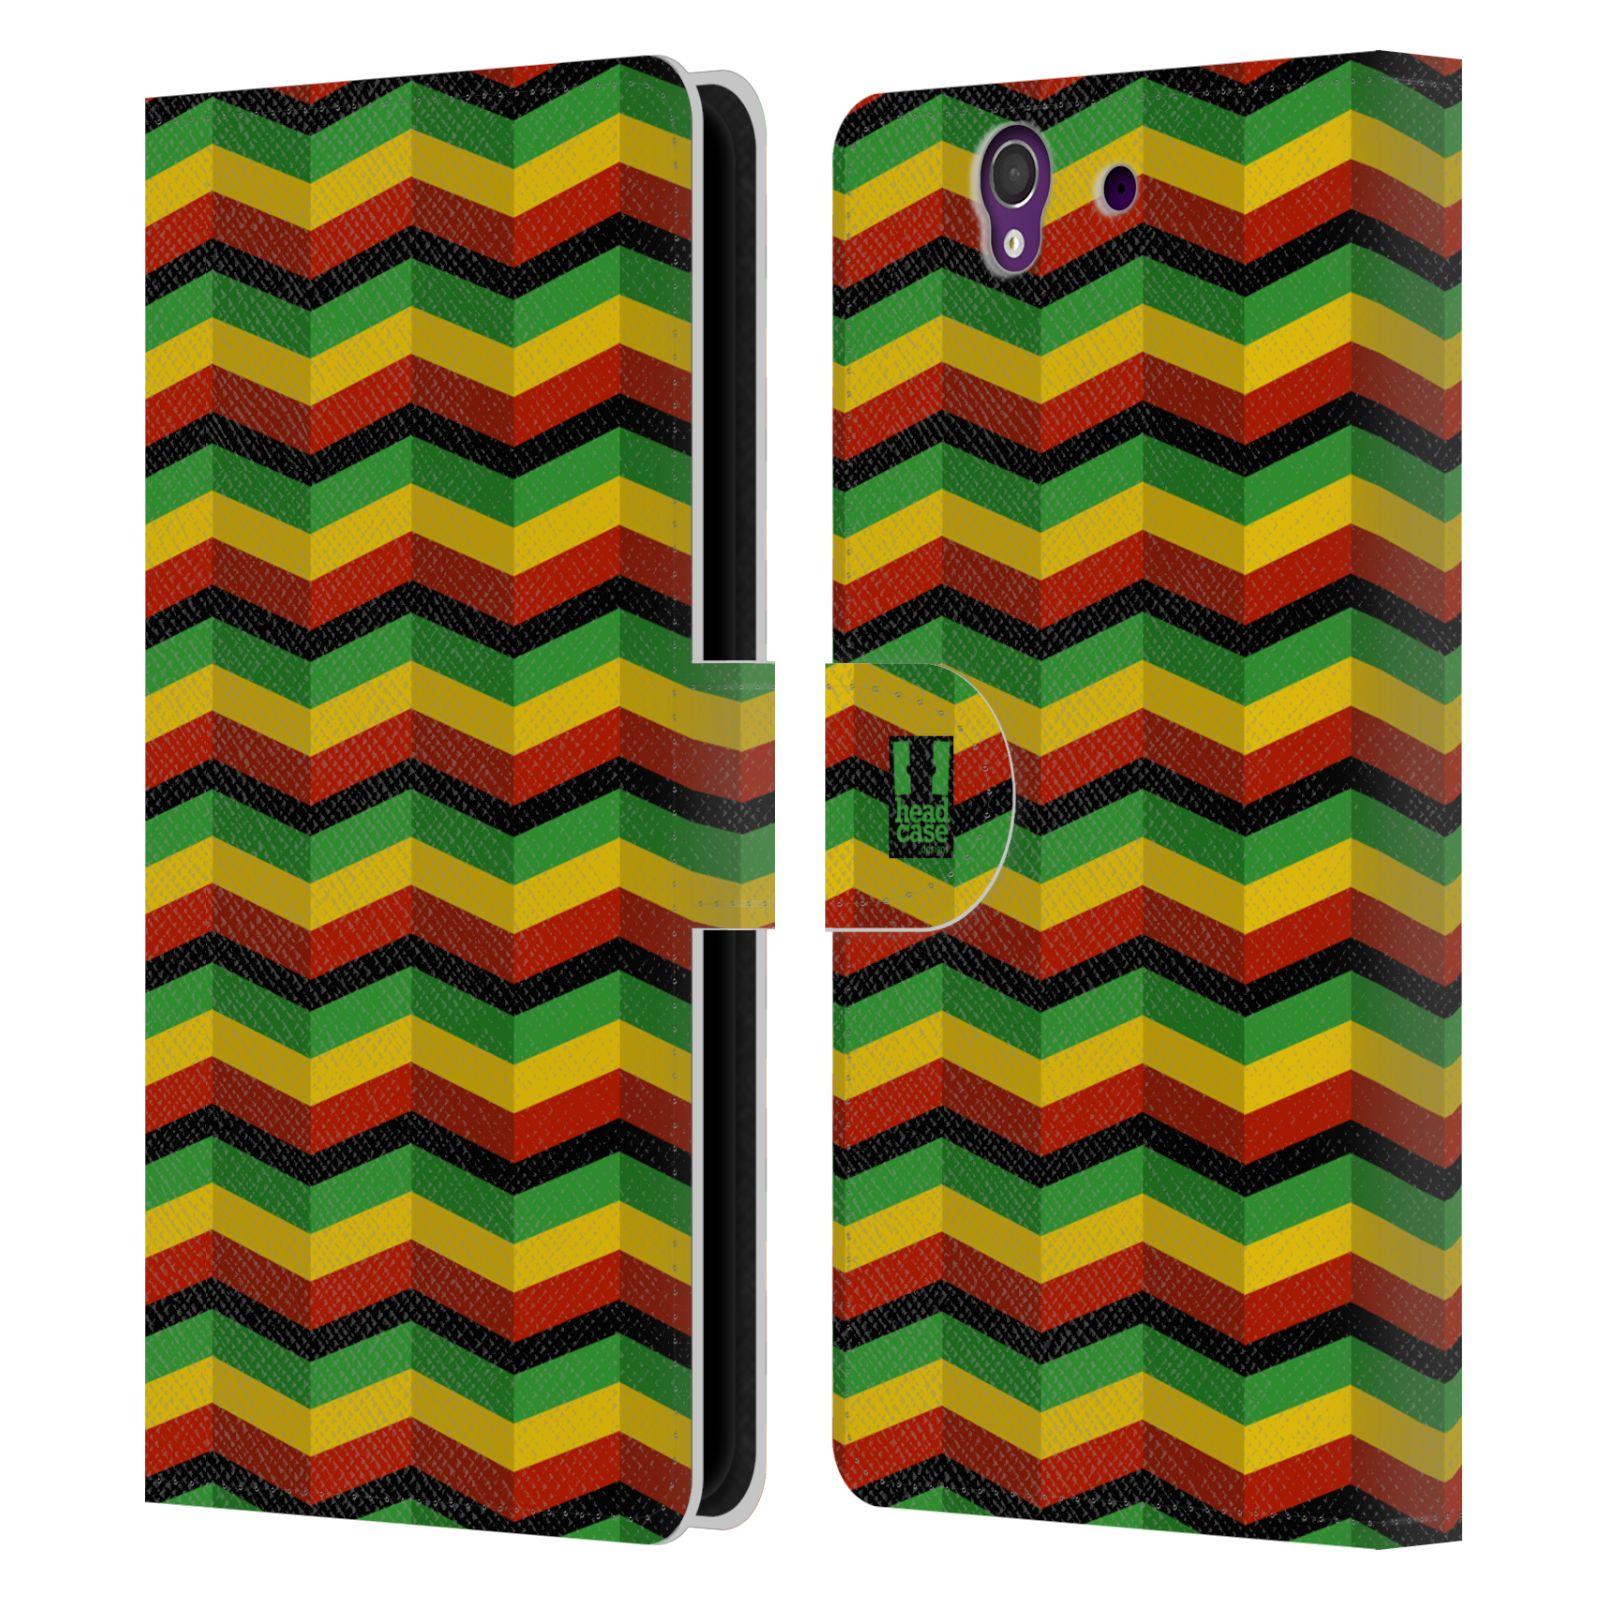 HEAD CASE Flipové pouzdro pro mobil SONY XPERIA Z (C6603) Rastafariánský motiv Jamajka CHEVRON